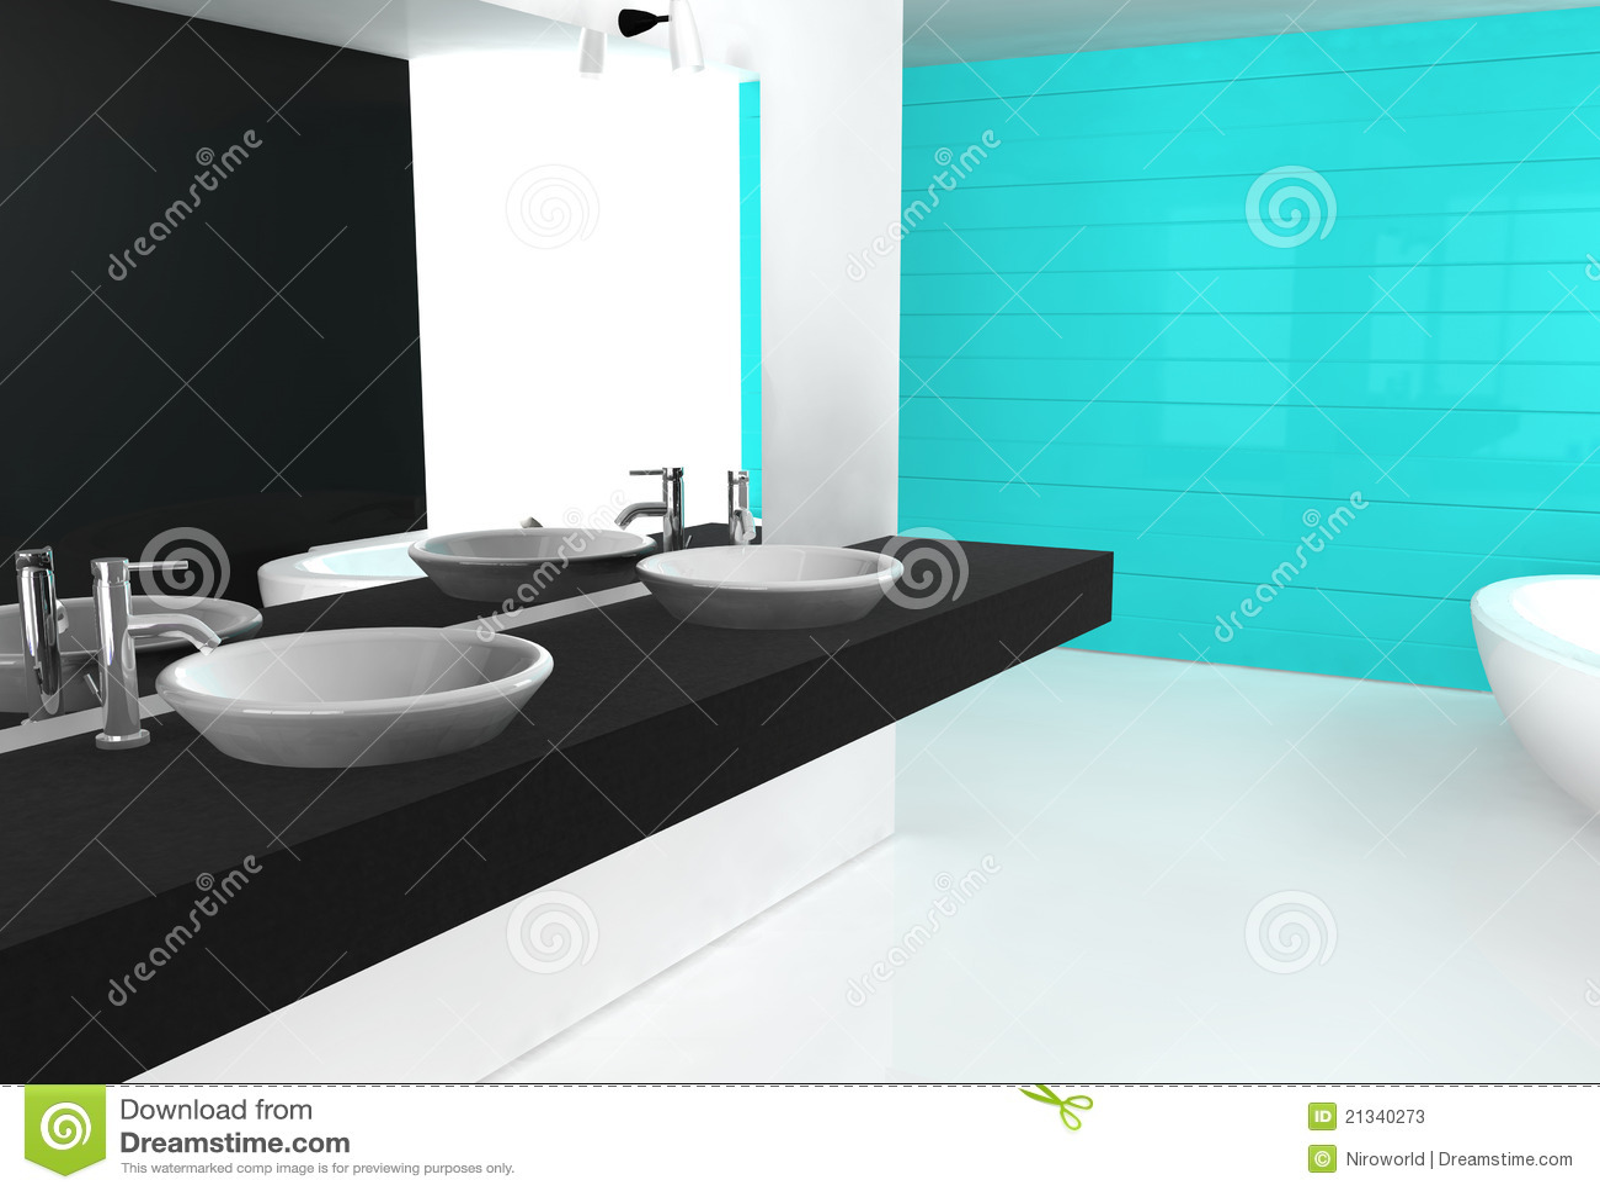 bathroom cyan stock photos - image: 21340273